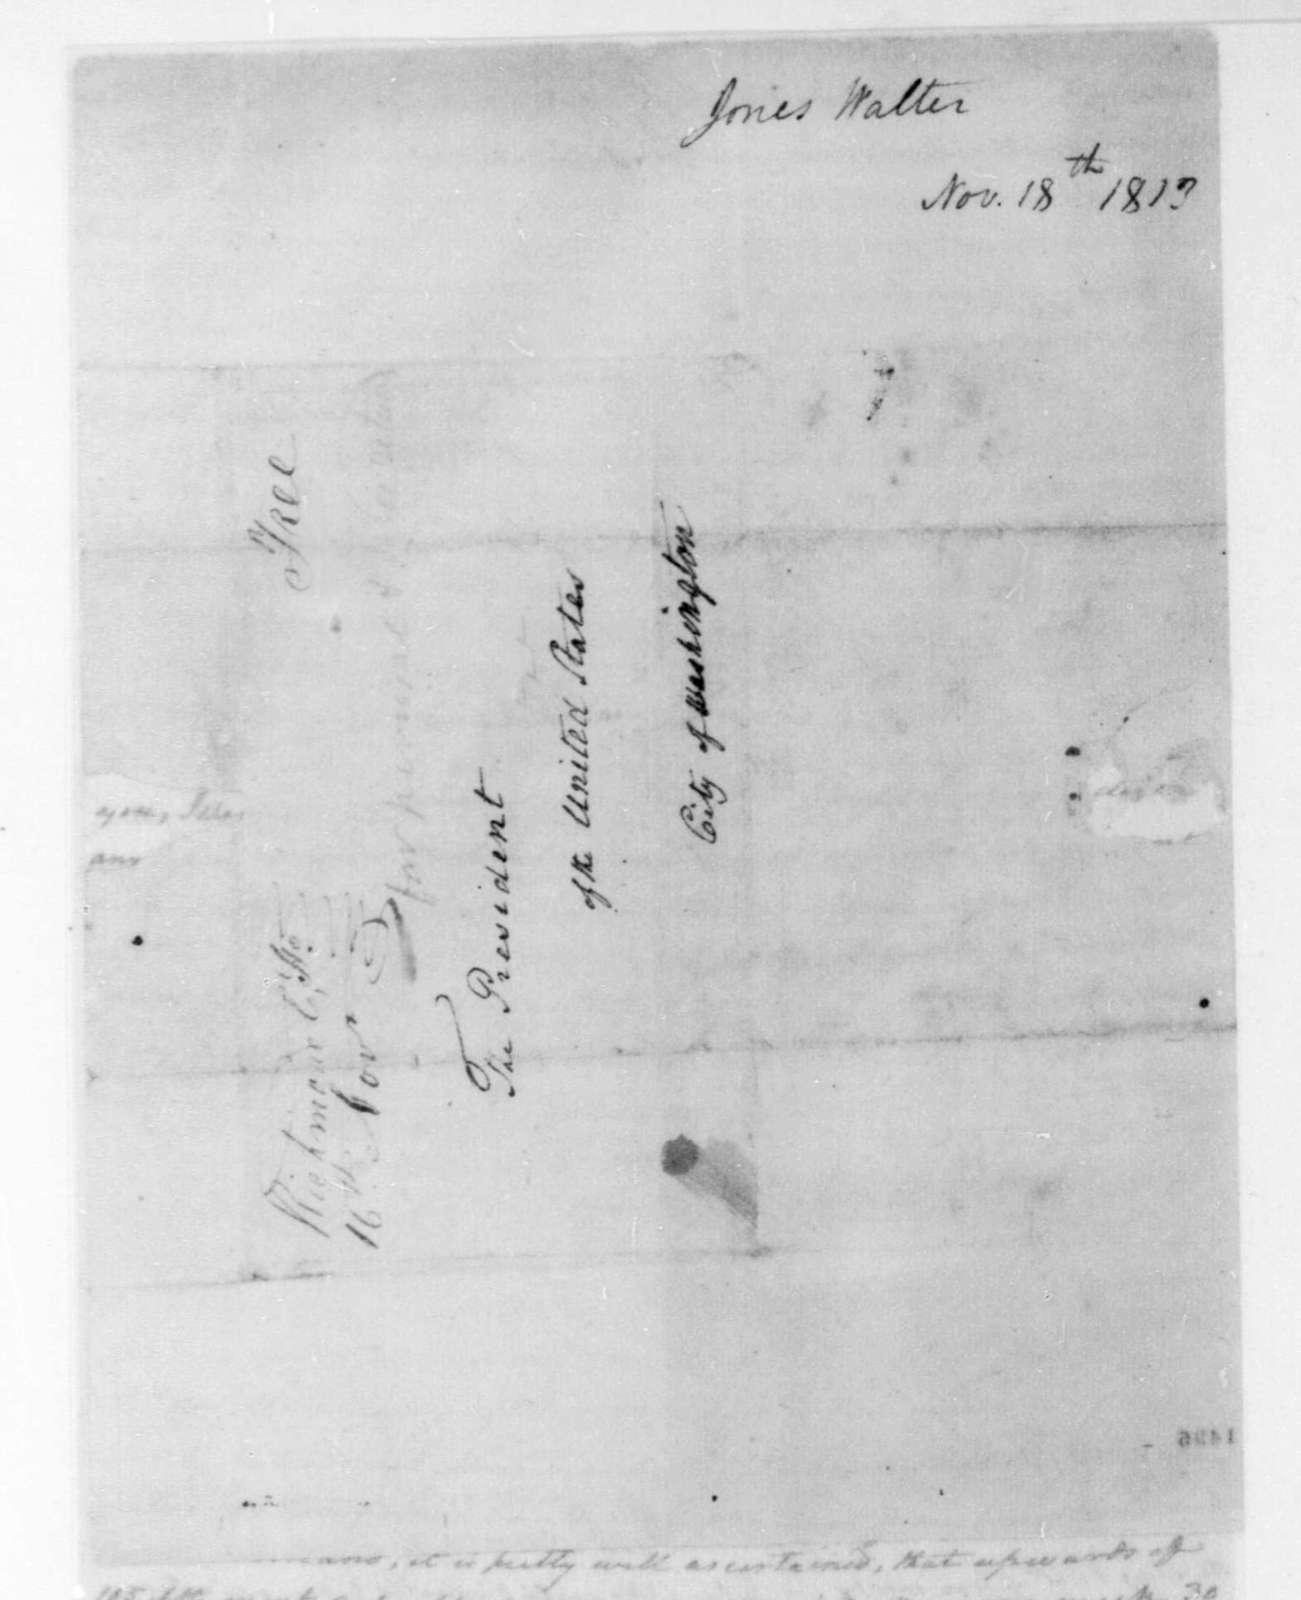 Walter Jones to James Madison, November 8, 1813.